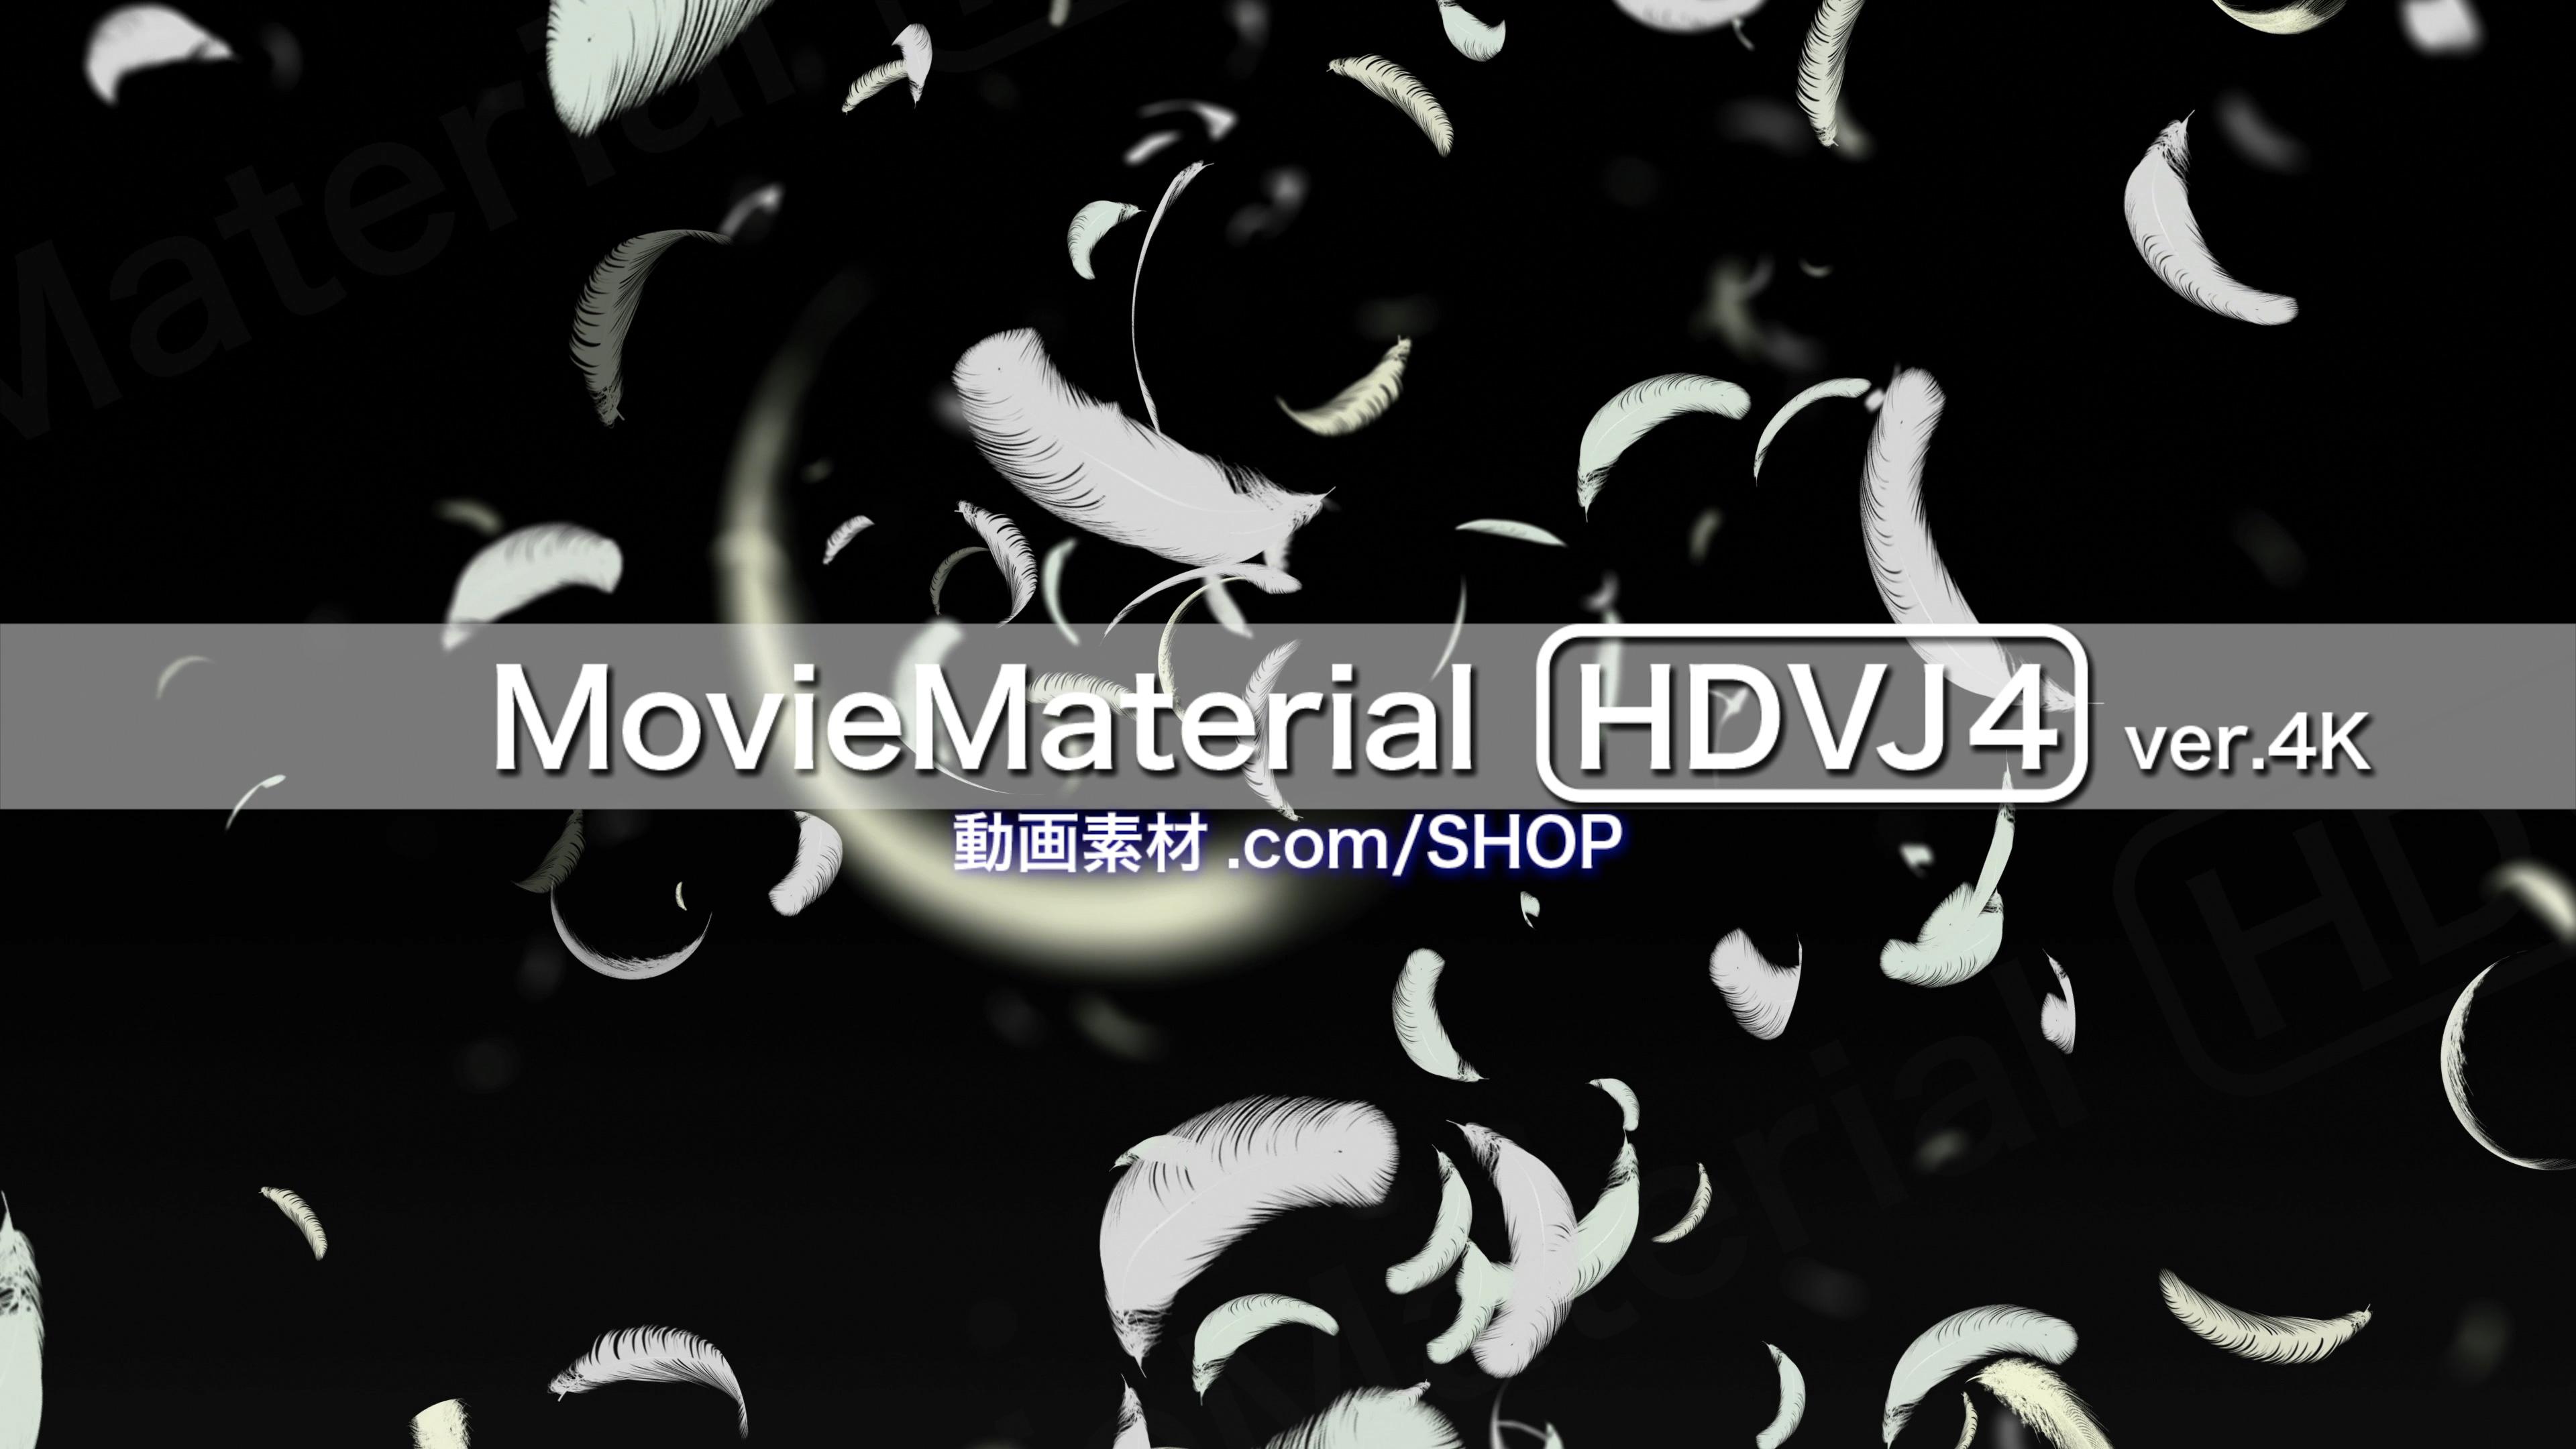 4K2Kループ動画素材集第4段【MovieMaterial HDVJ4 ver.4K】ロイヤリティフリー(著作権使用料無料)8